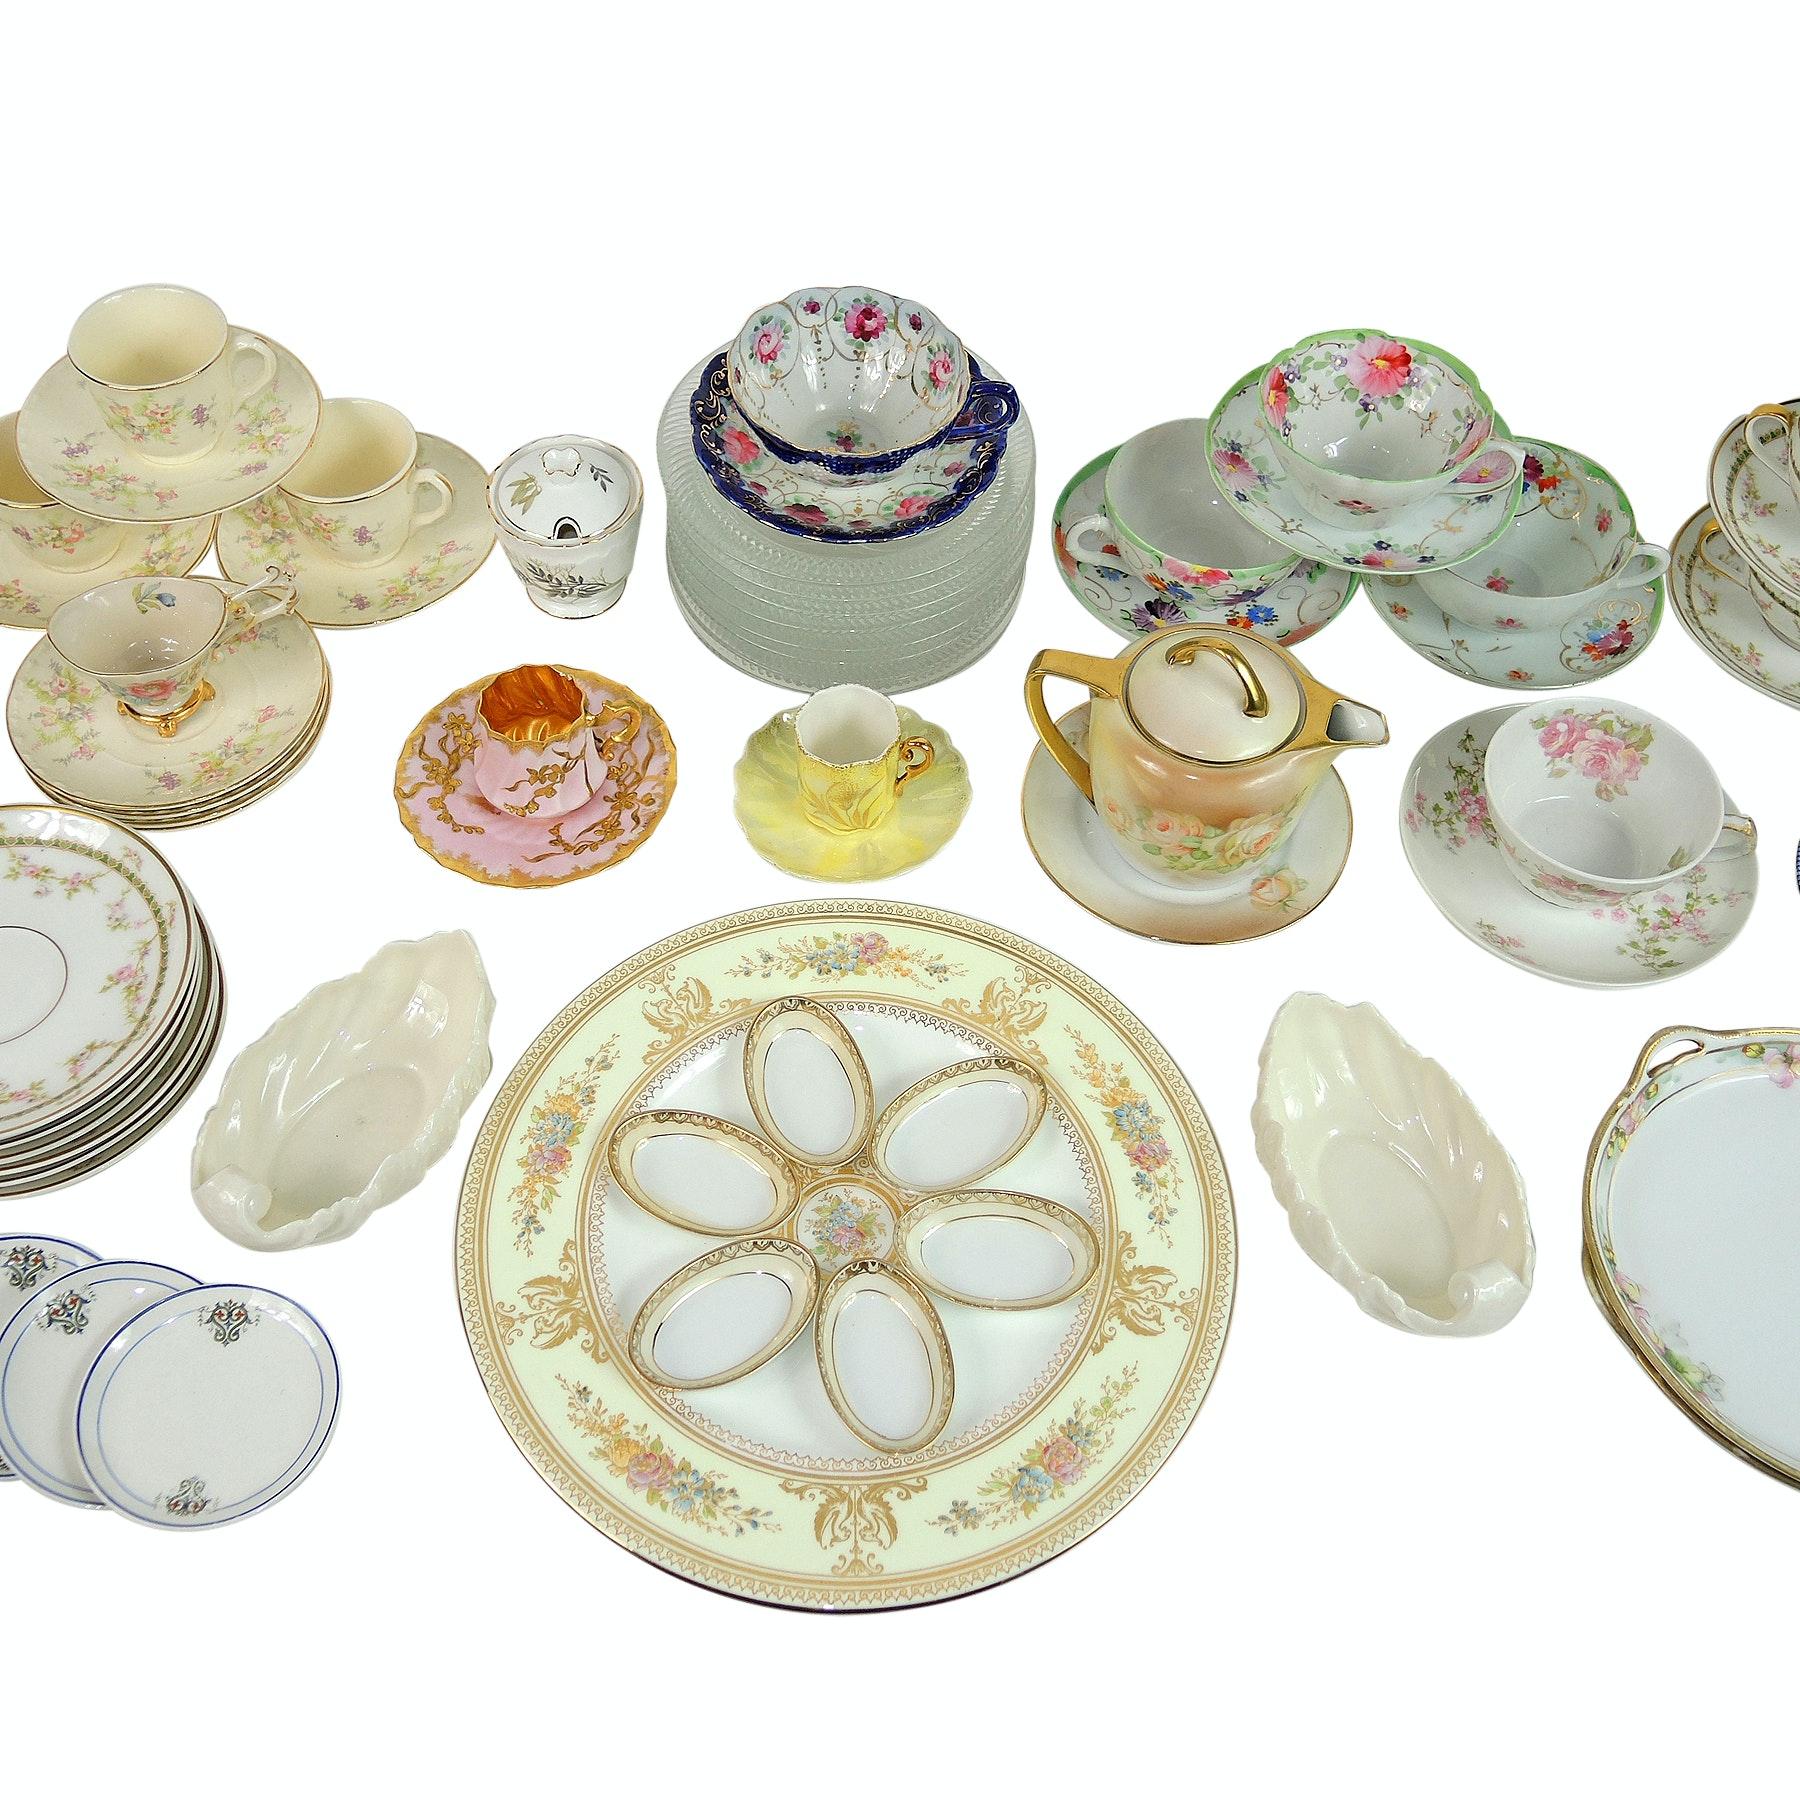 Vintage Porcelain Hand-Painted Tableware including Belleek, Limoges and Wedgwood